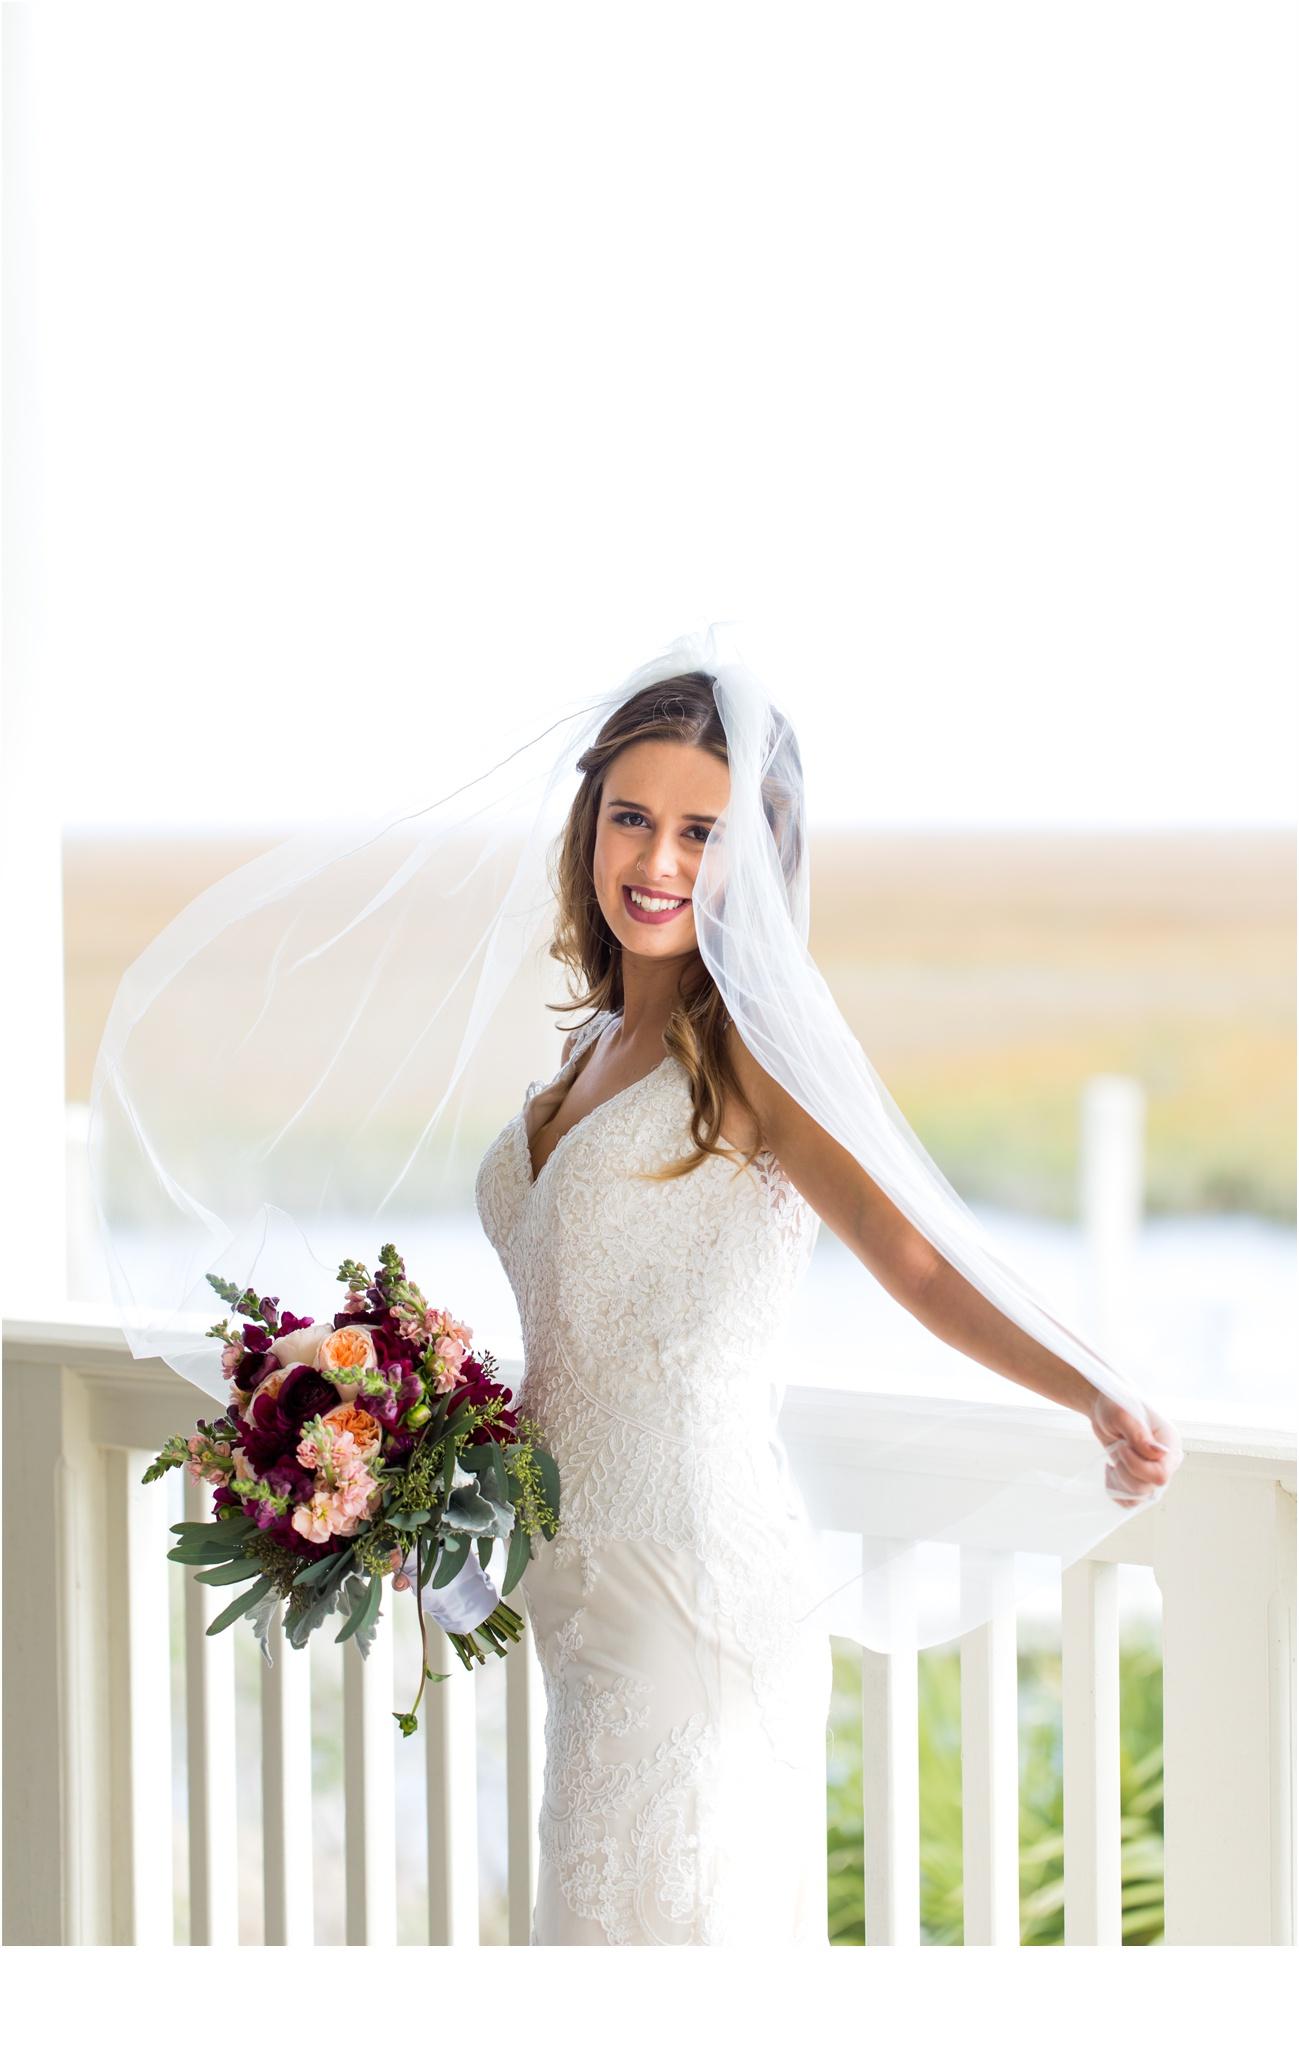 Rainey_Gregg_Photography_St._Simons_Island_Georgia_California_Wedding_Portrait_Photography_0773.jpg